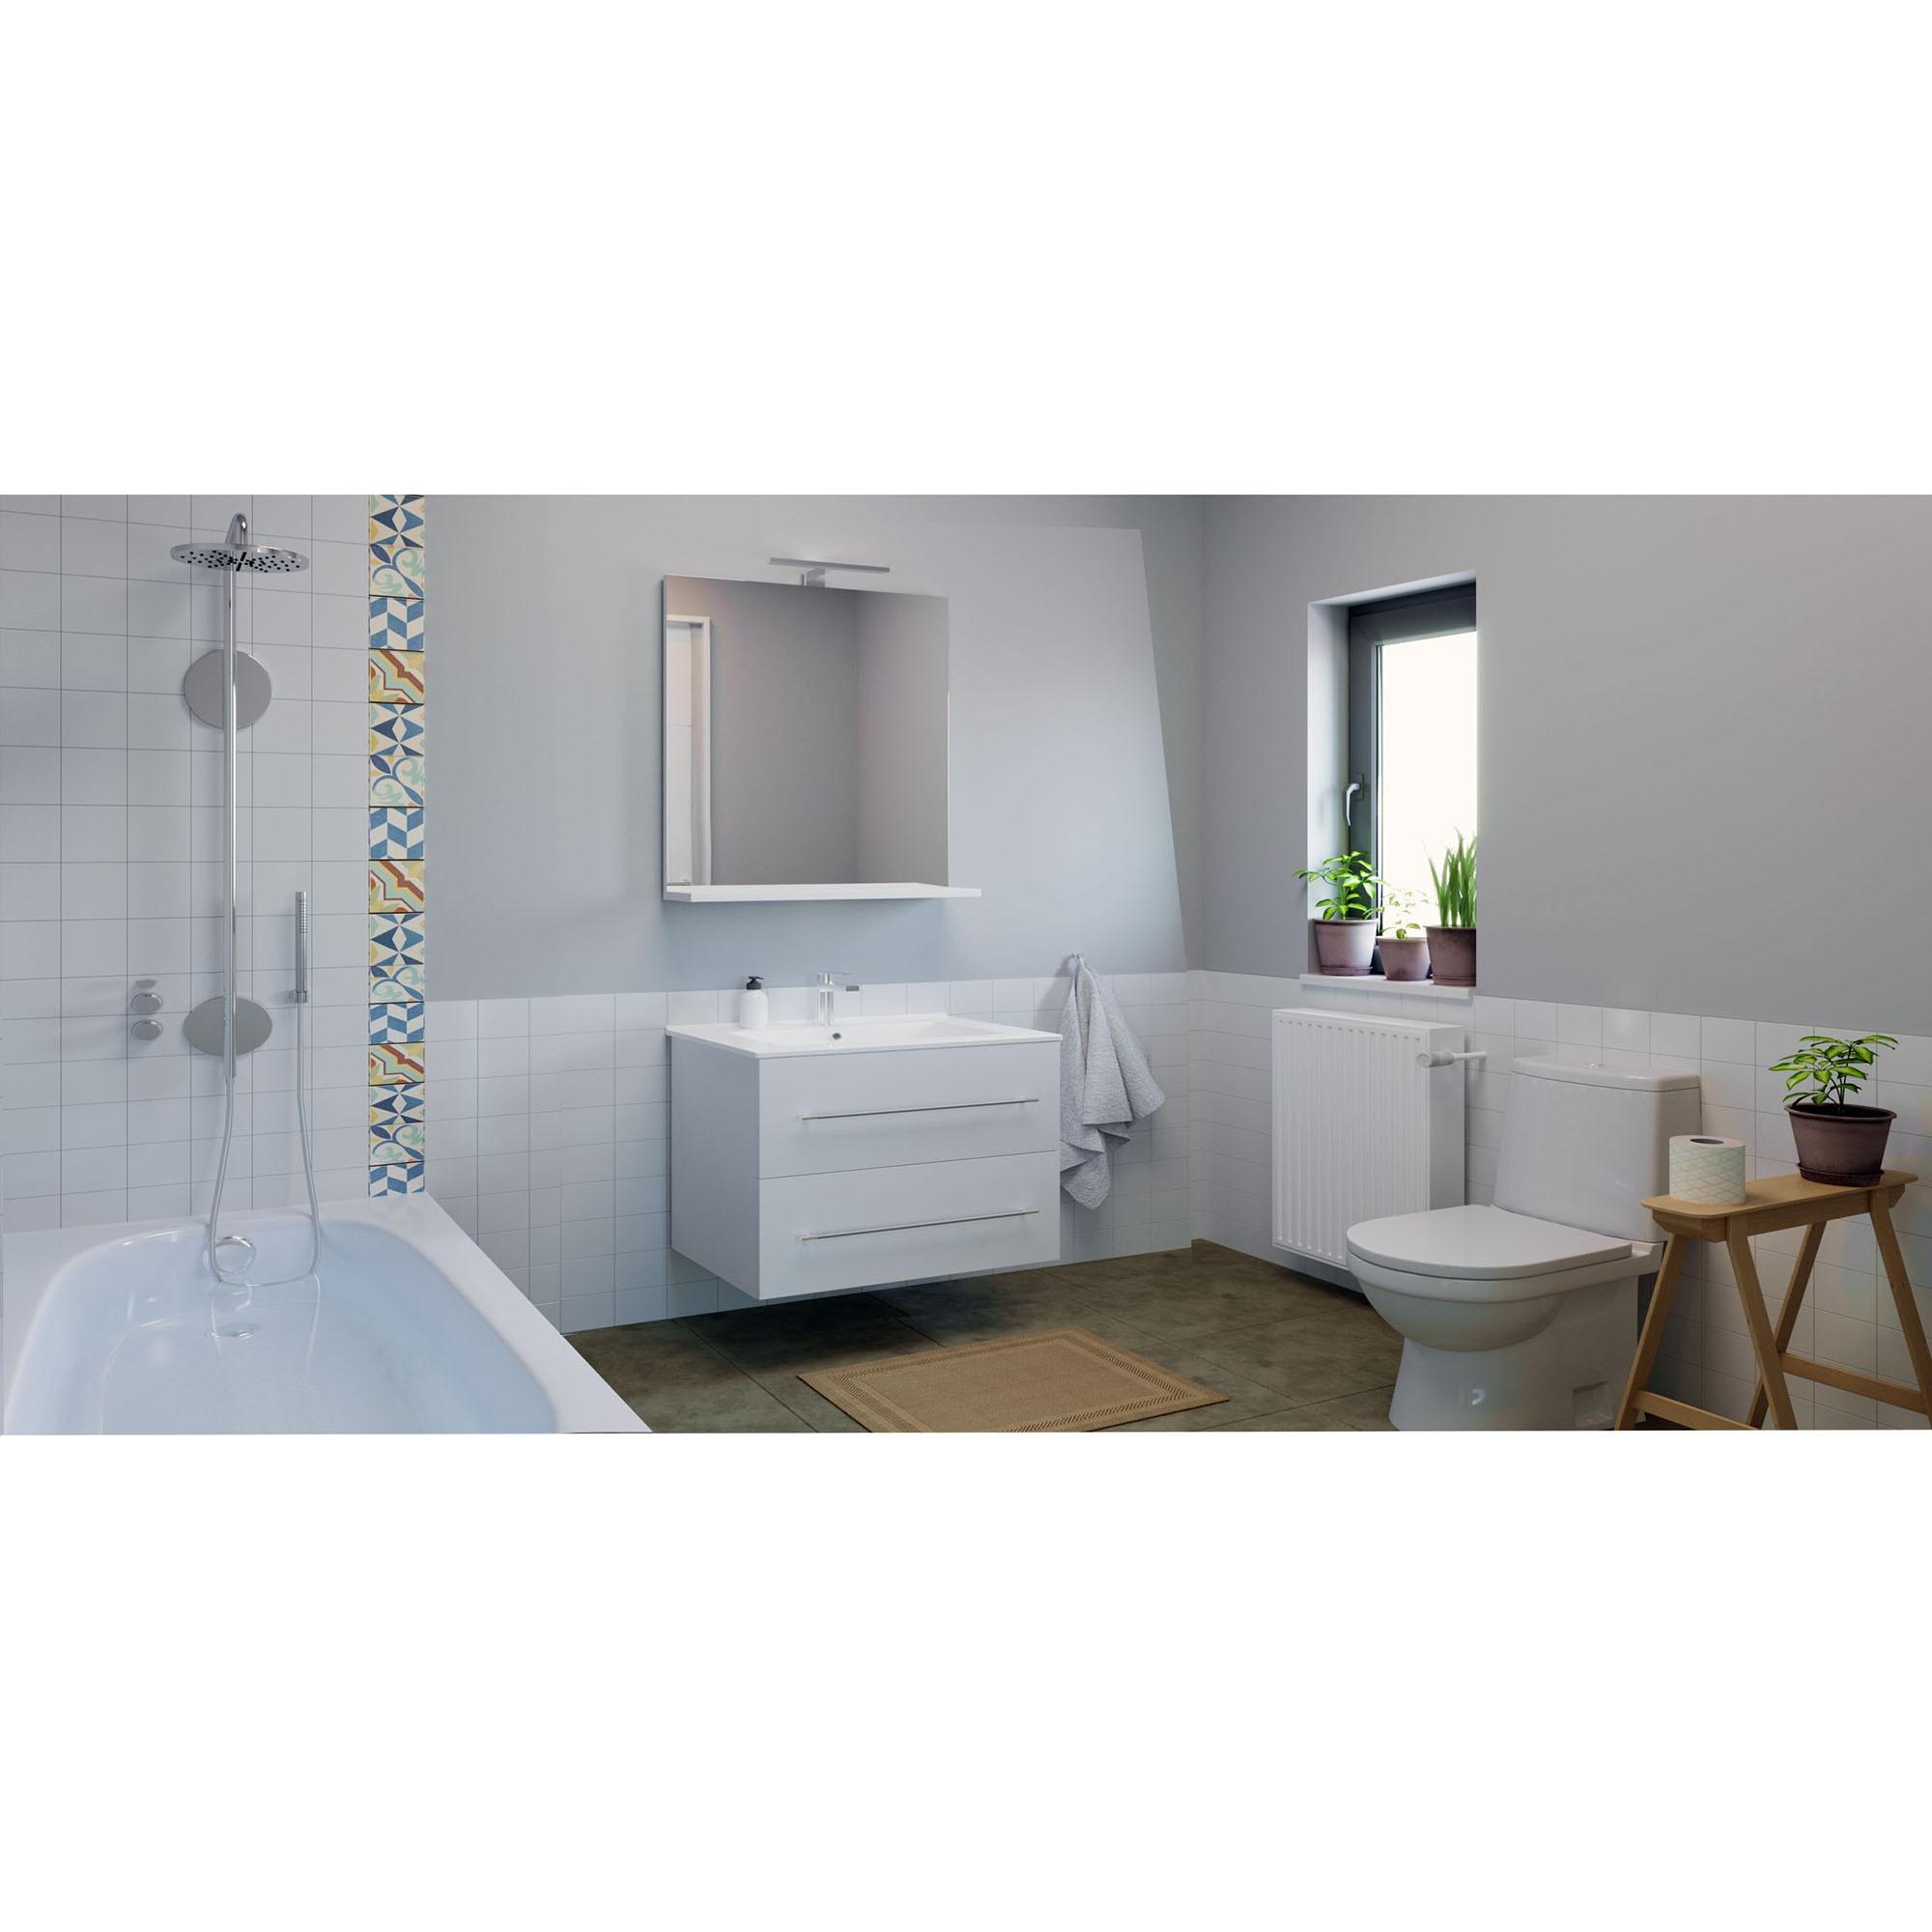 Fotografie Baza mobilier si lavoar Badenmob 054, suspendat, sertare, alb, 80 cm